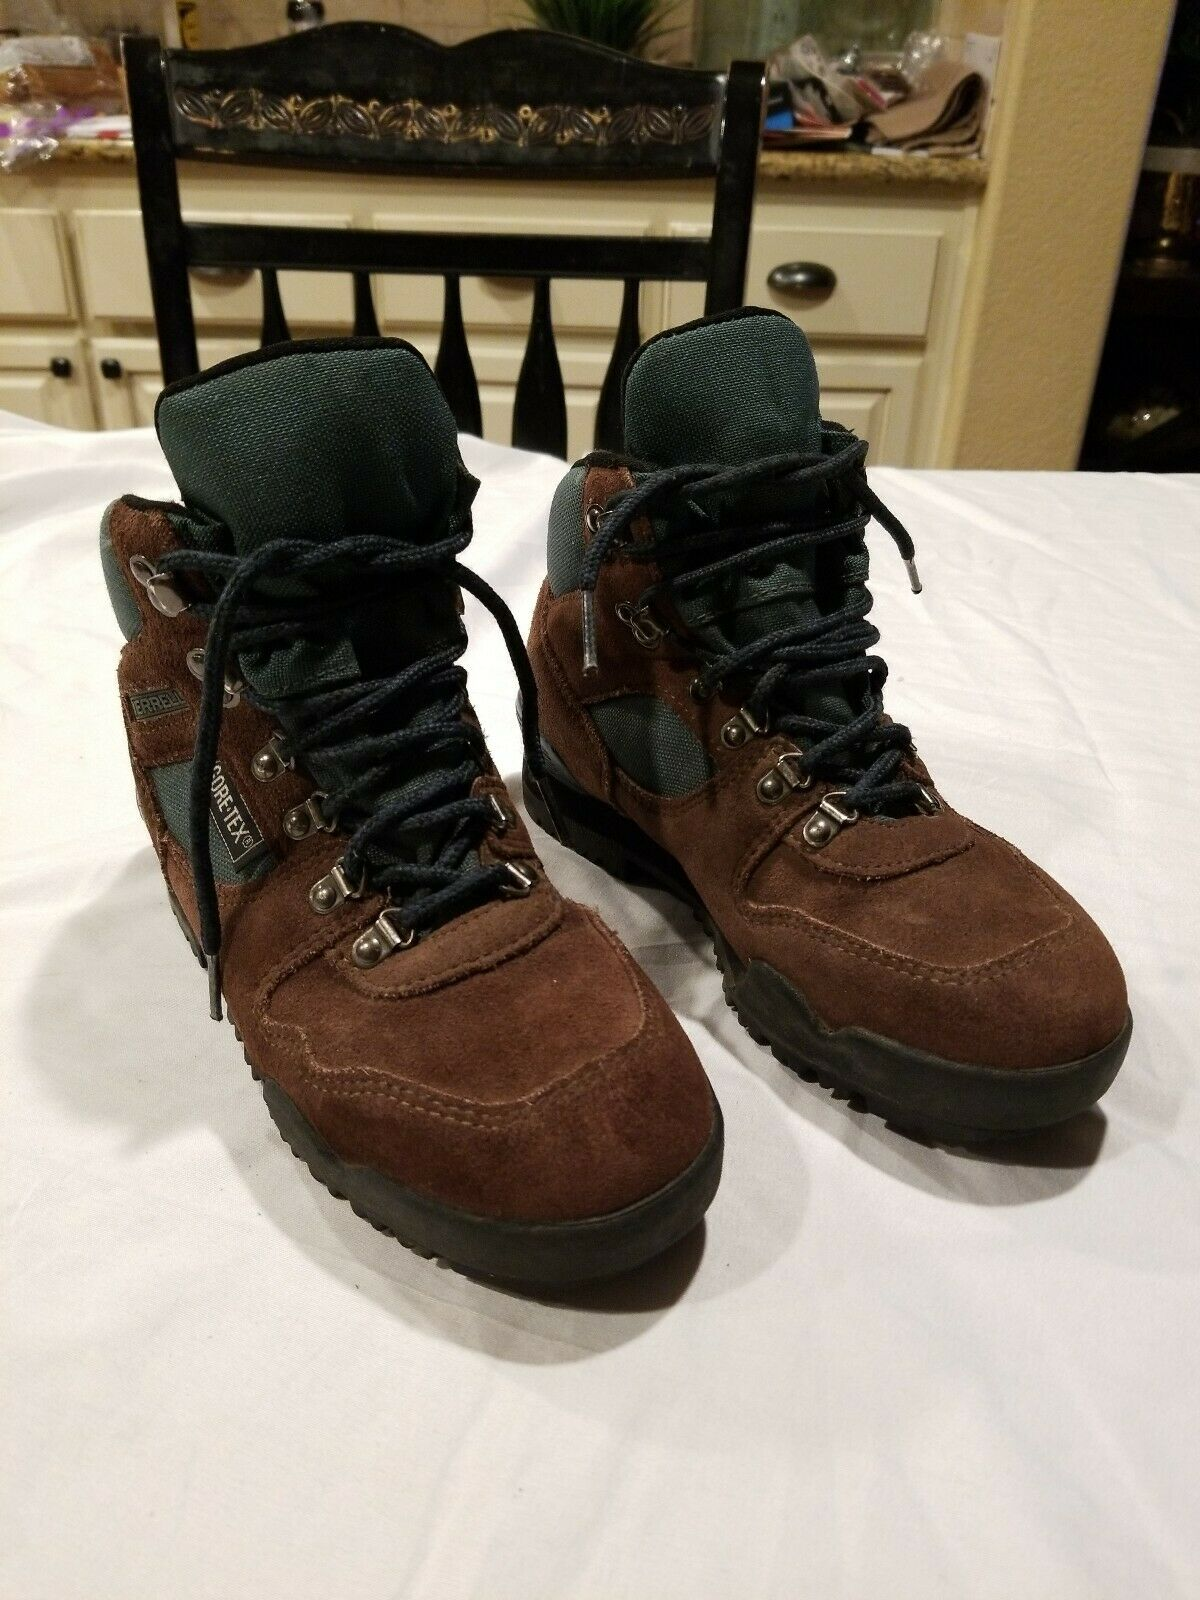 Merrell Nova GTX Gore-Tex Brown Suede Hiking Trail Boot Women's 6.5 Pre-owned